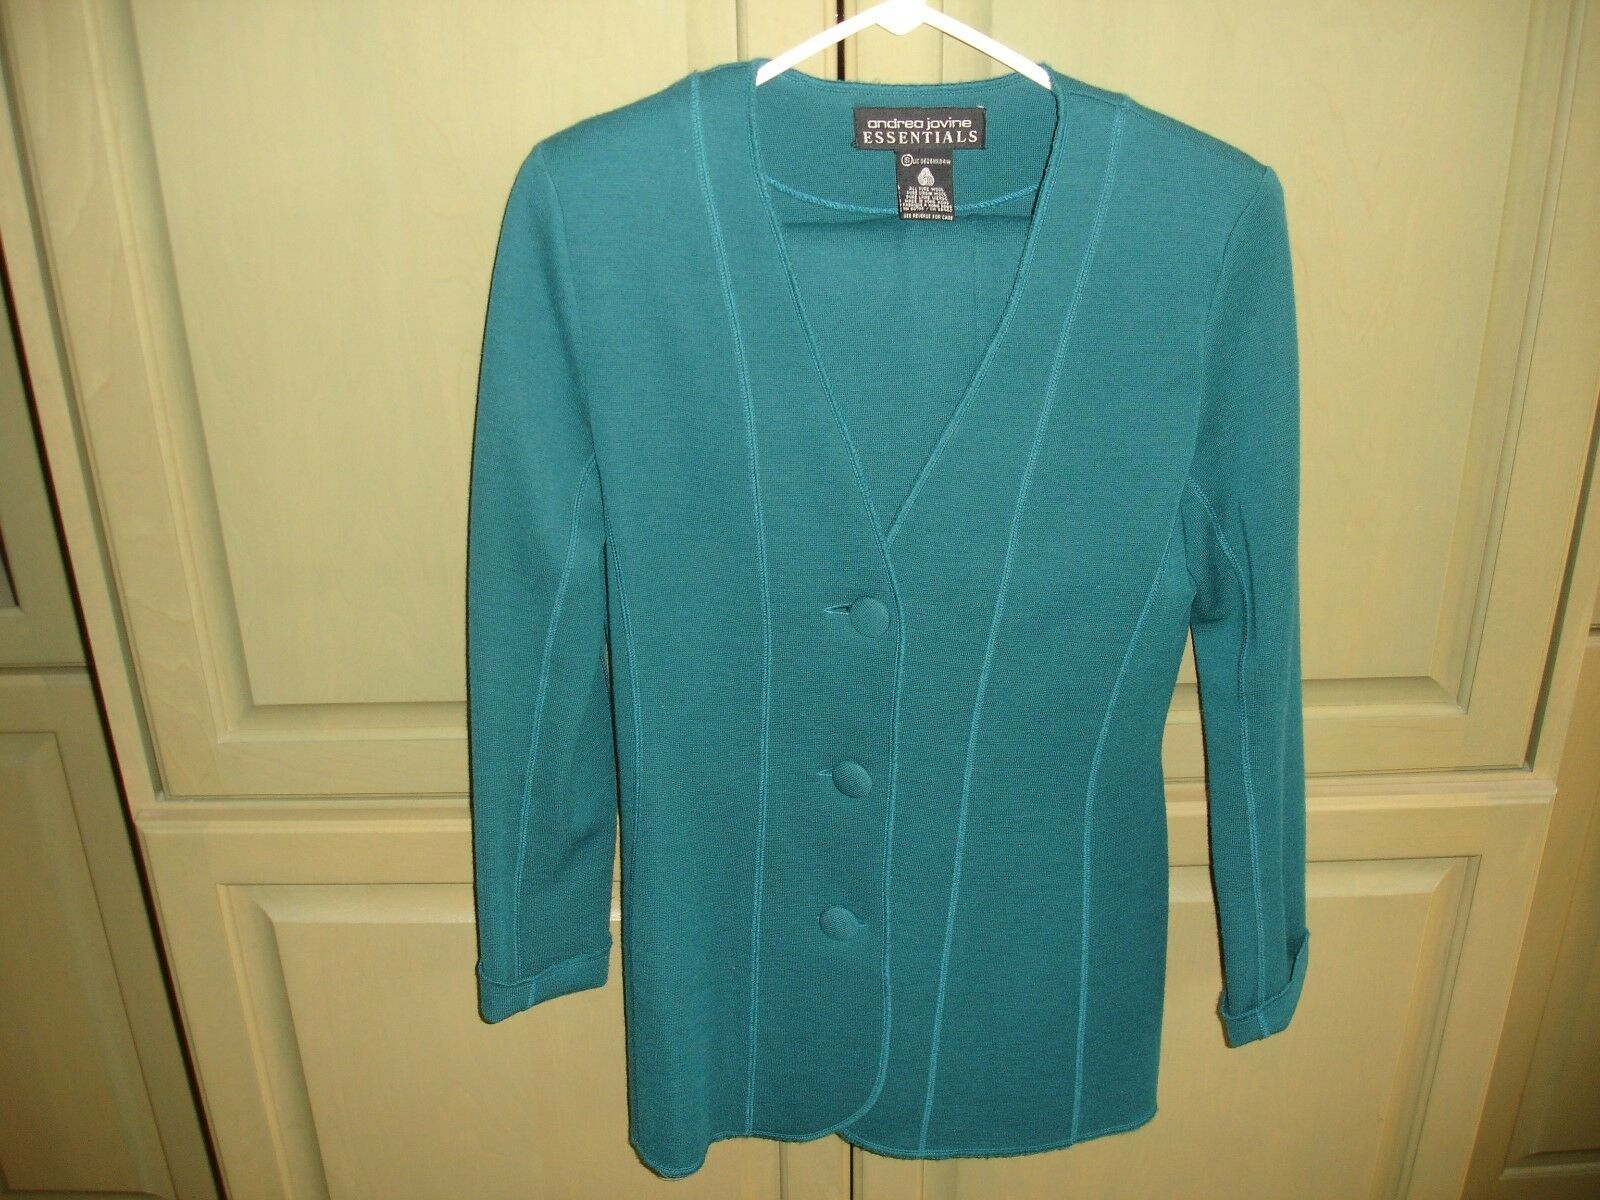 ANDREA JOVINE ESSENTIALS Size S  2pc Teal Knit Pants Set  Pure Virgin Wool